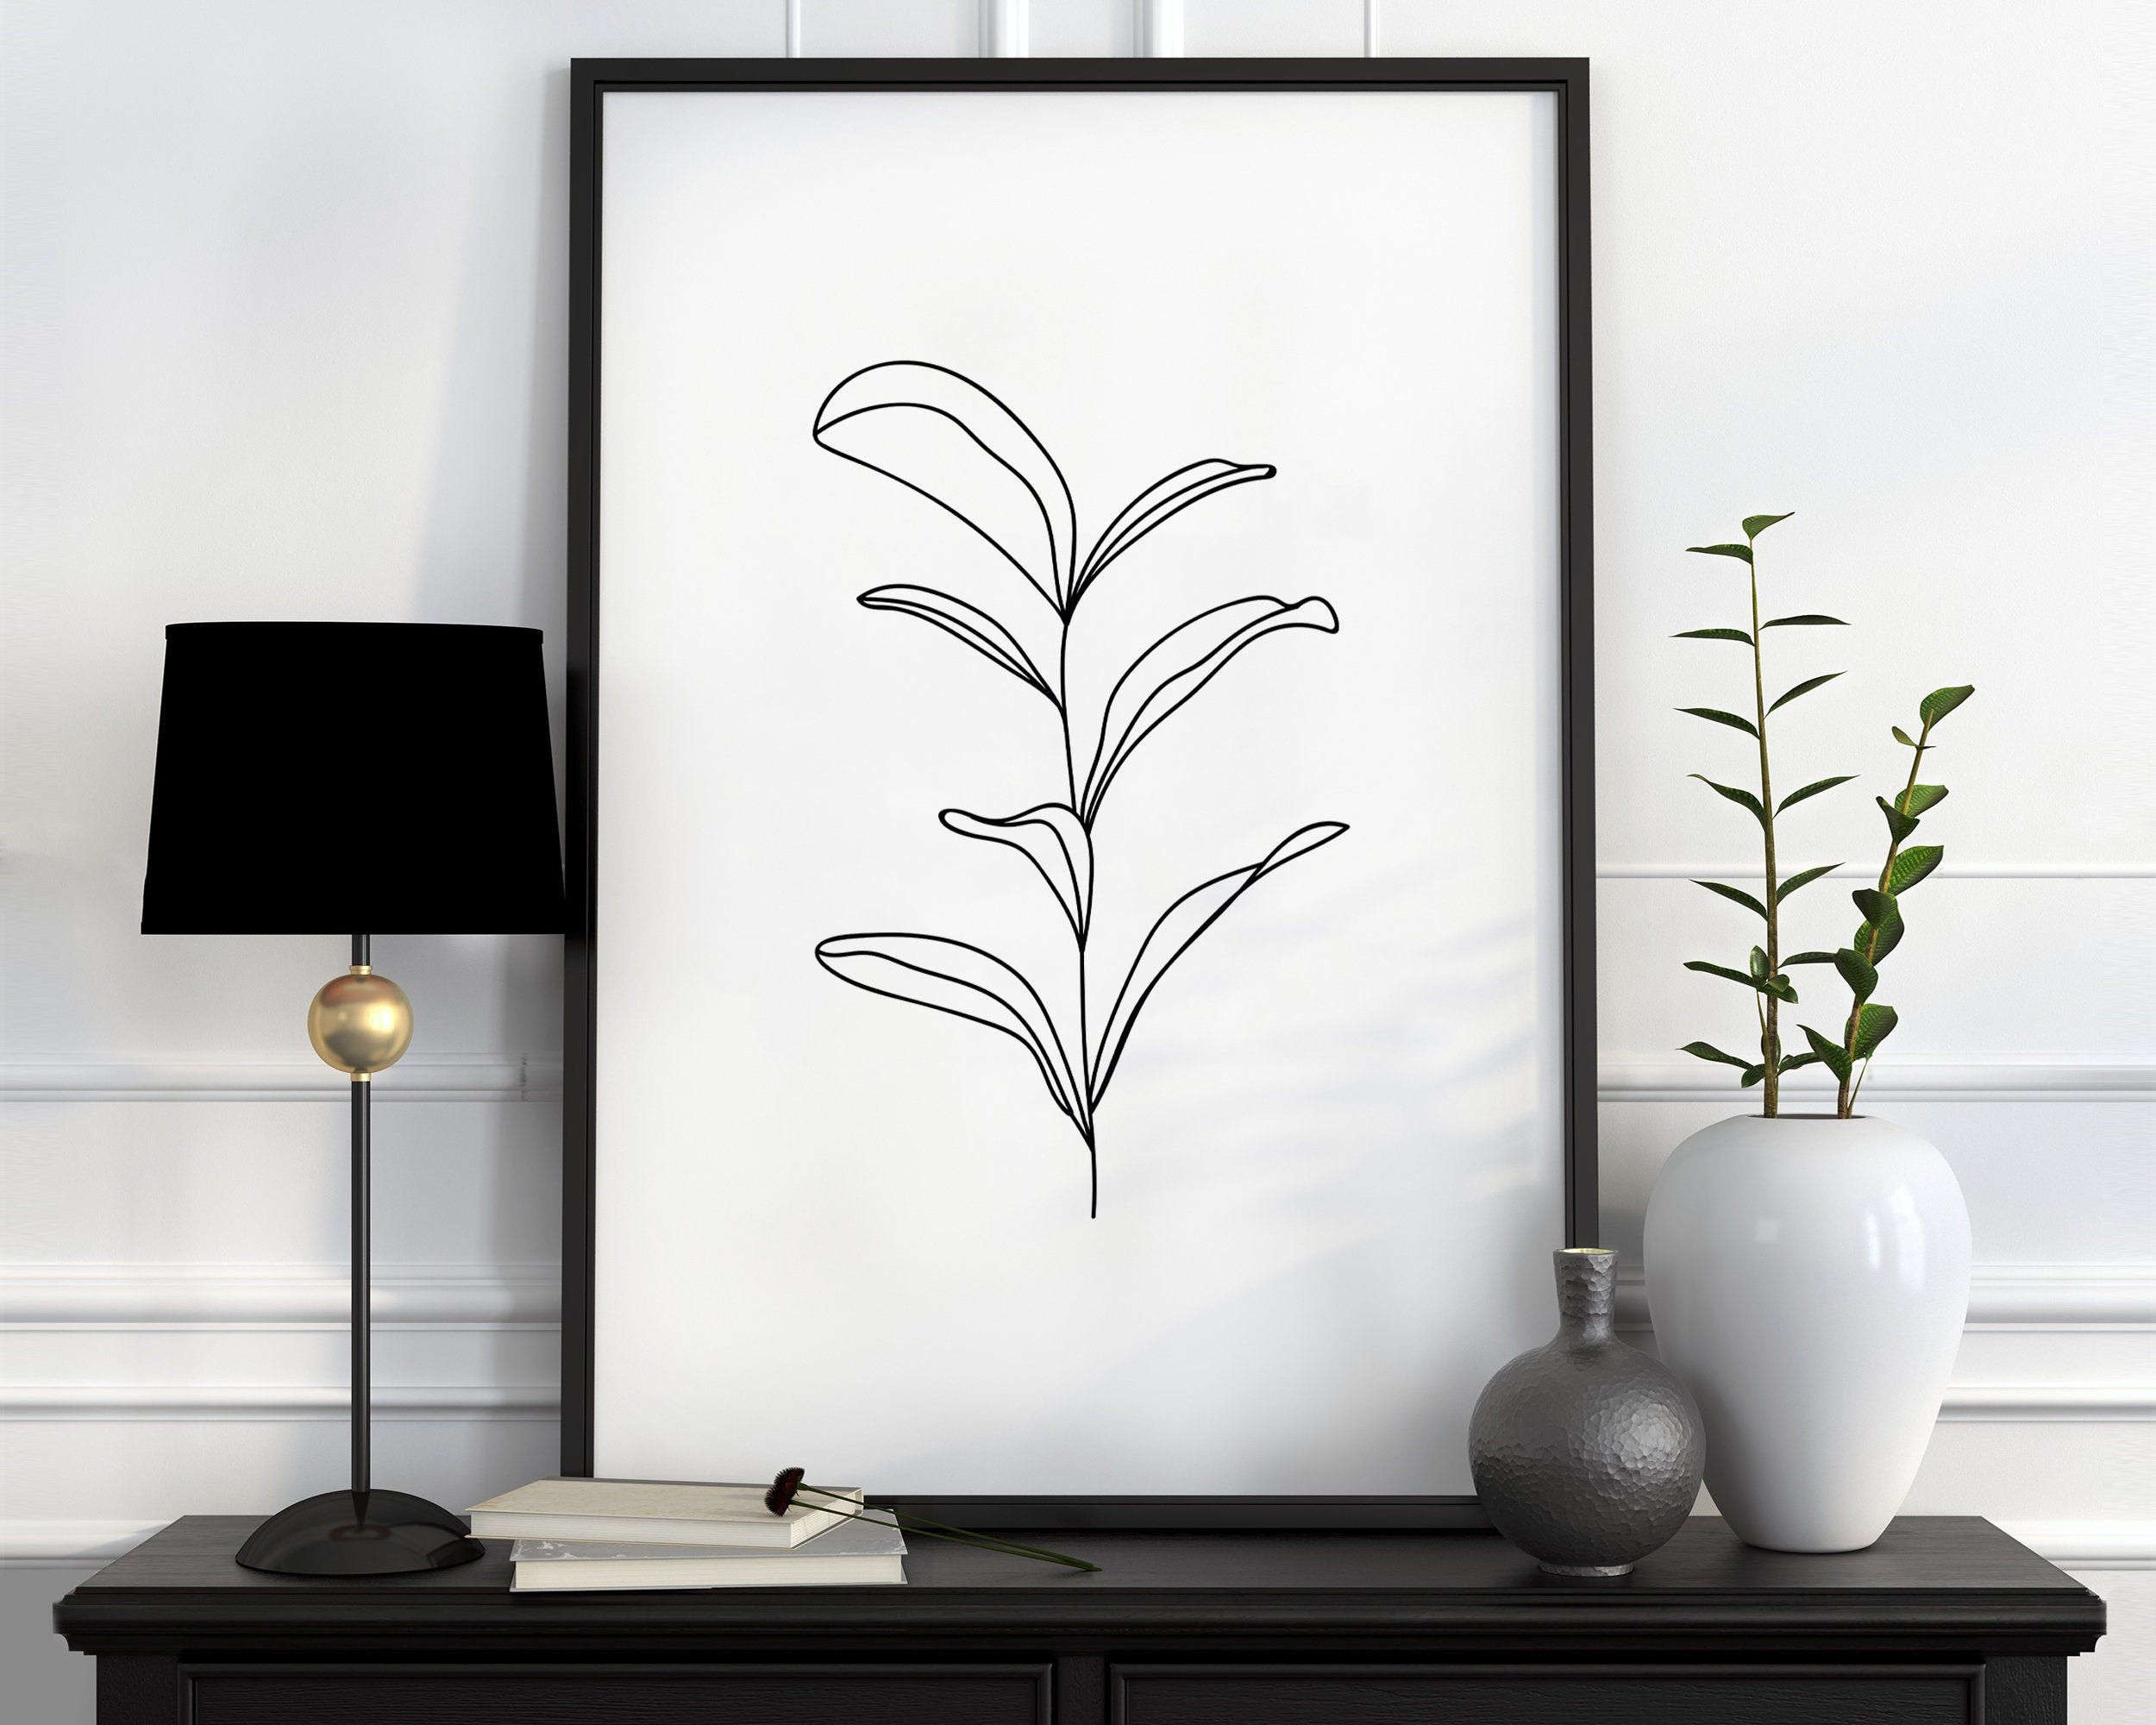 Botanic Wall Art, Abstract Leaves Print, Botanical Nordic Sketch, Minimalist Plant Art, Single Line Drawing, Modern Art Minimal Nature Print -   14 minimalist planting Art ideas